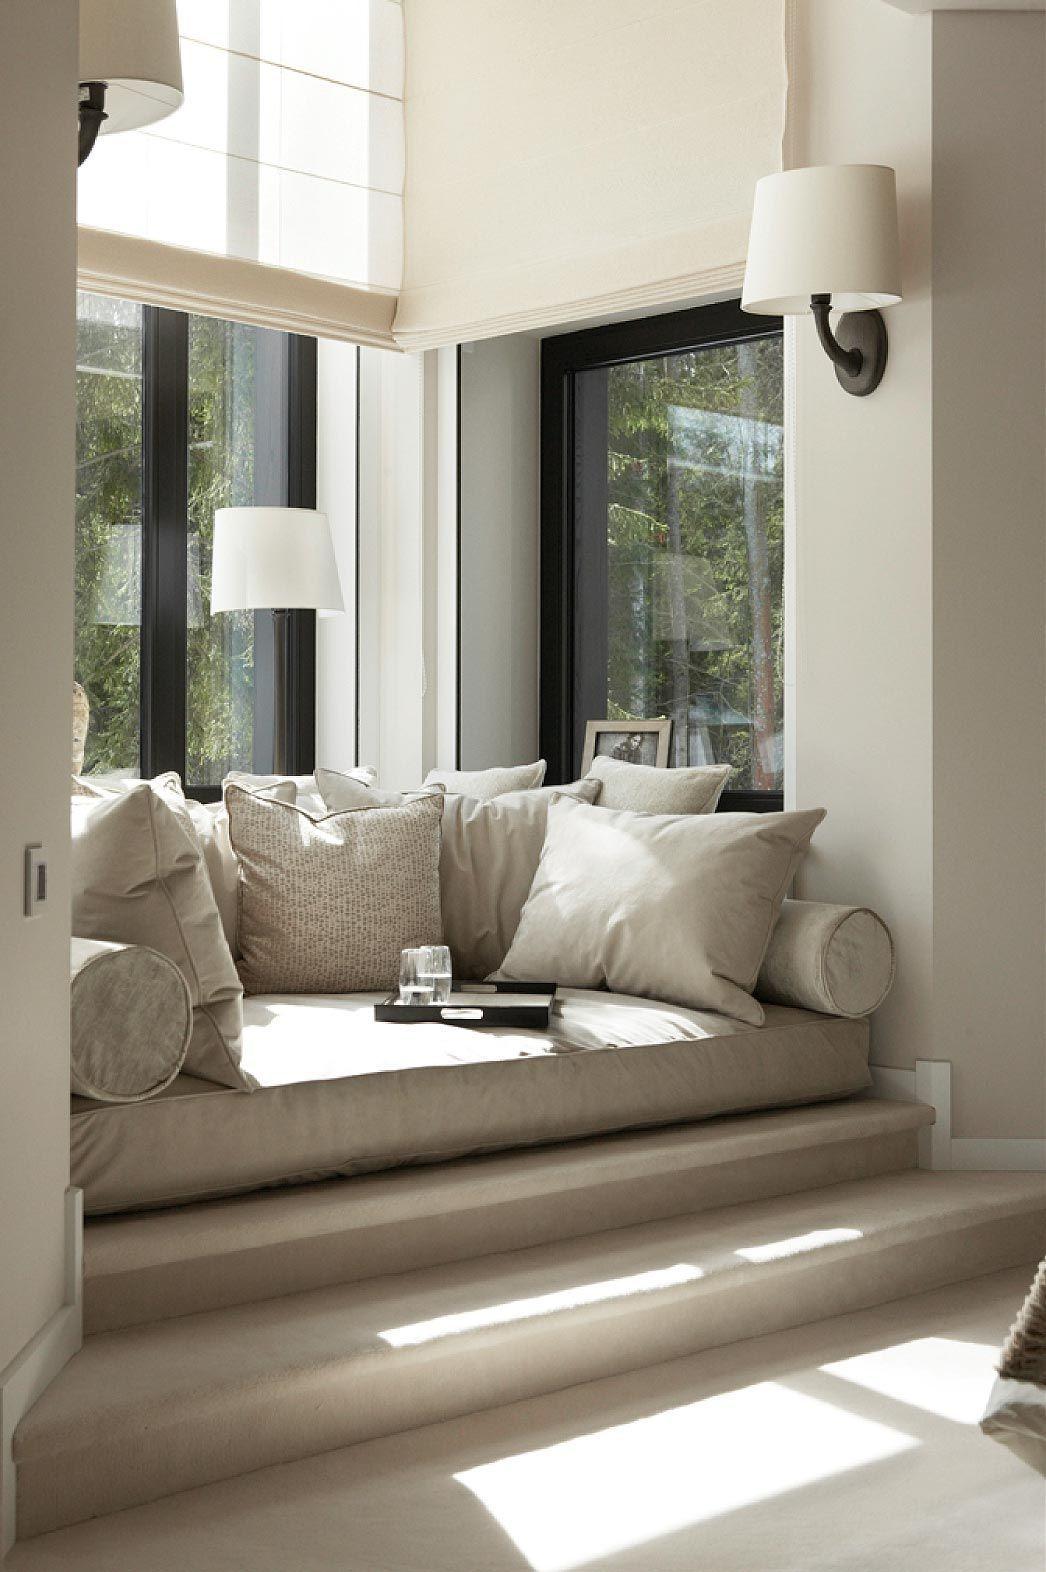 Bay window decor ideas   bay window decorating ideas blending functionality with modern